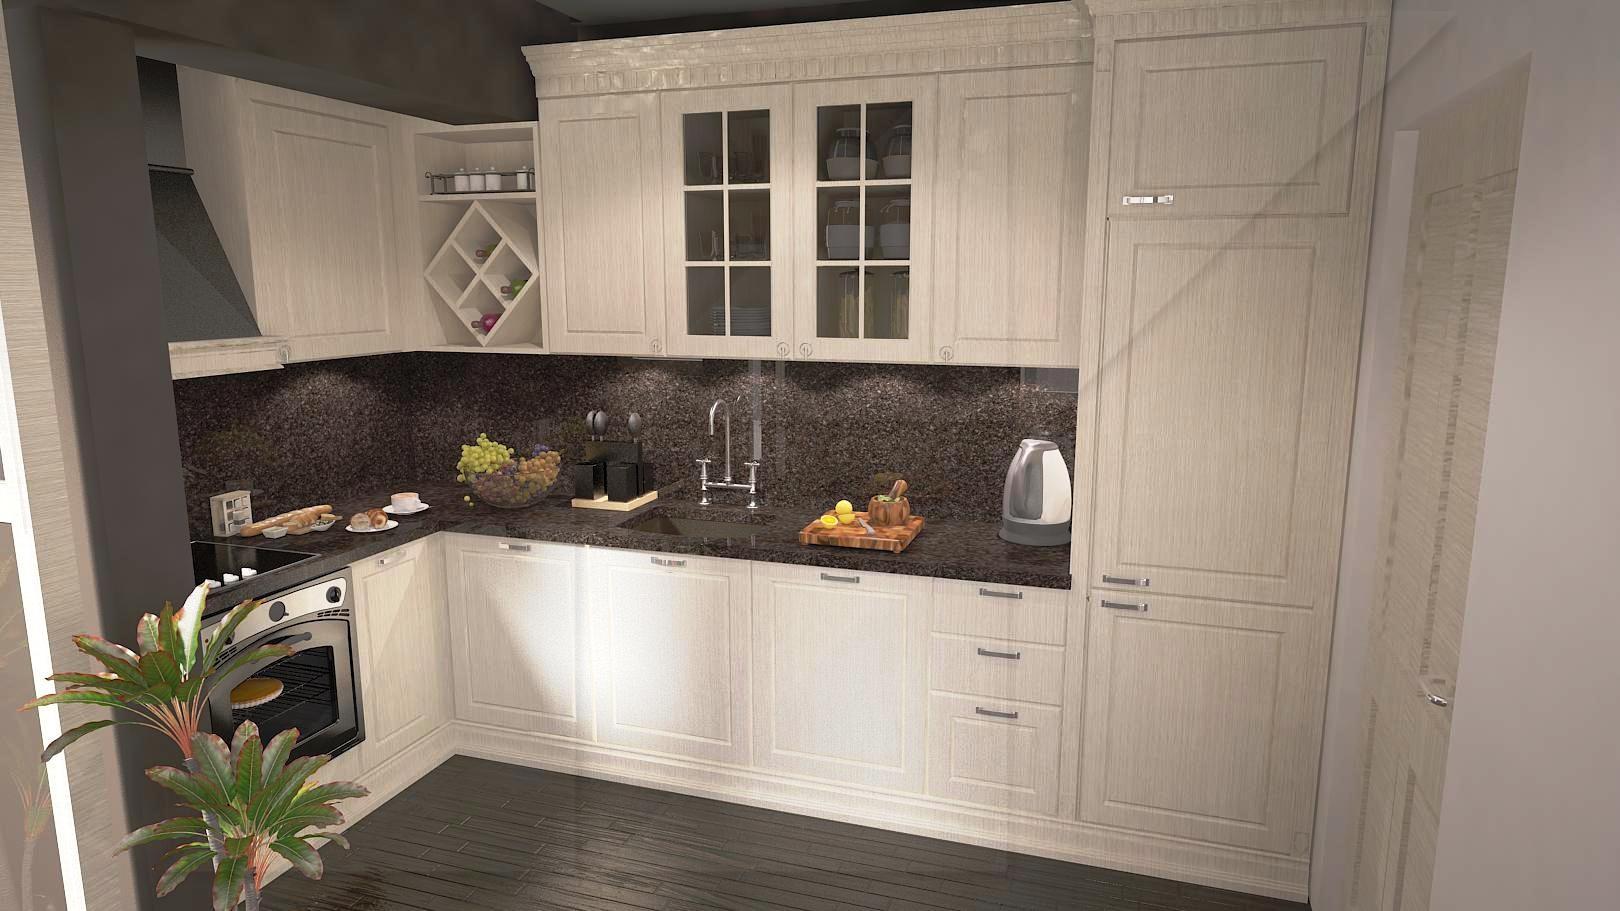 Retro kitchens interior design - | Aprime.bg